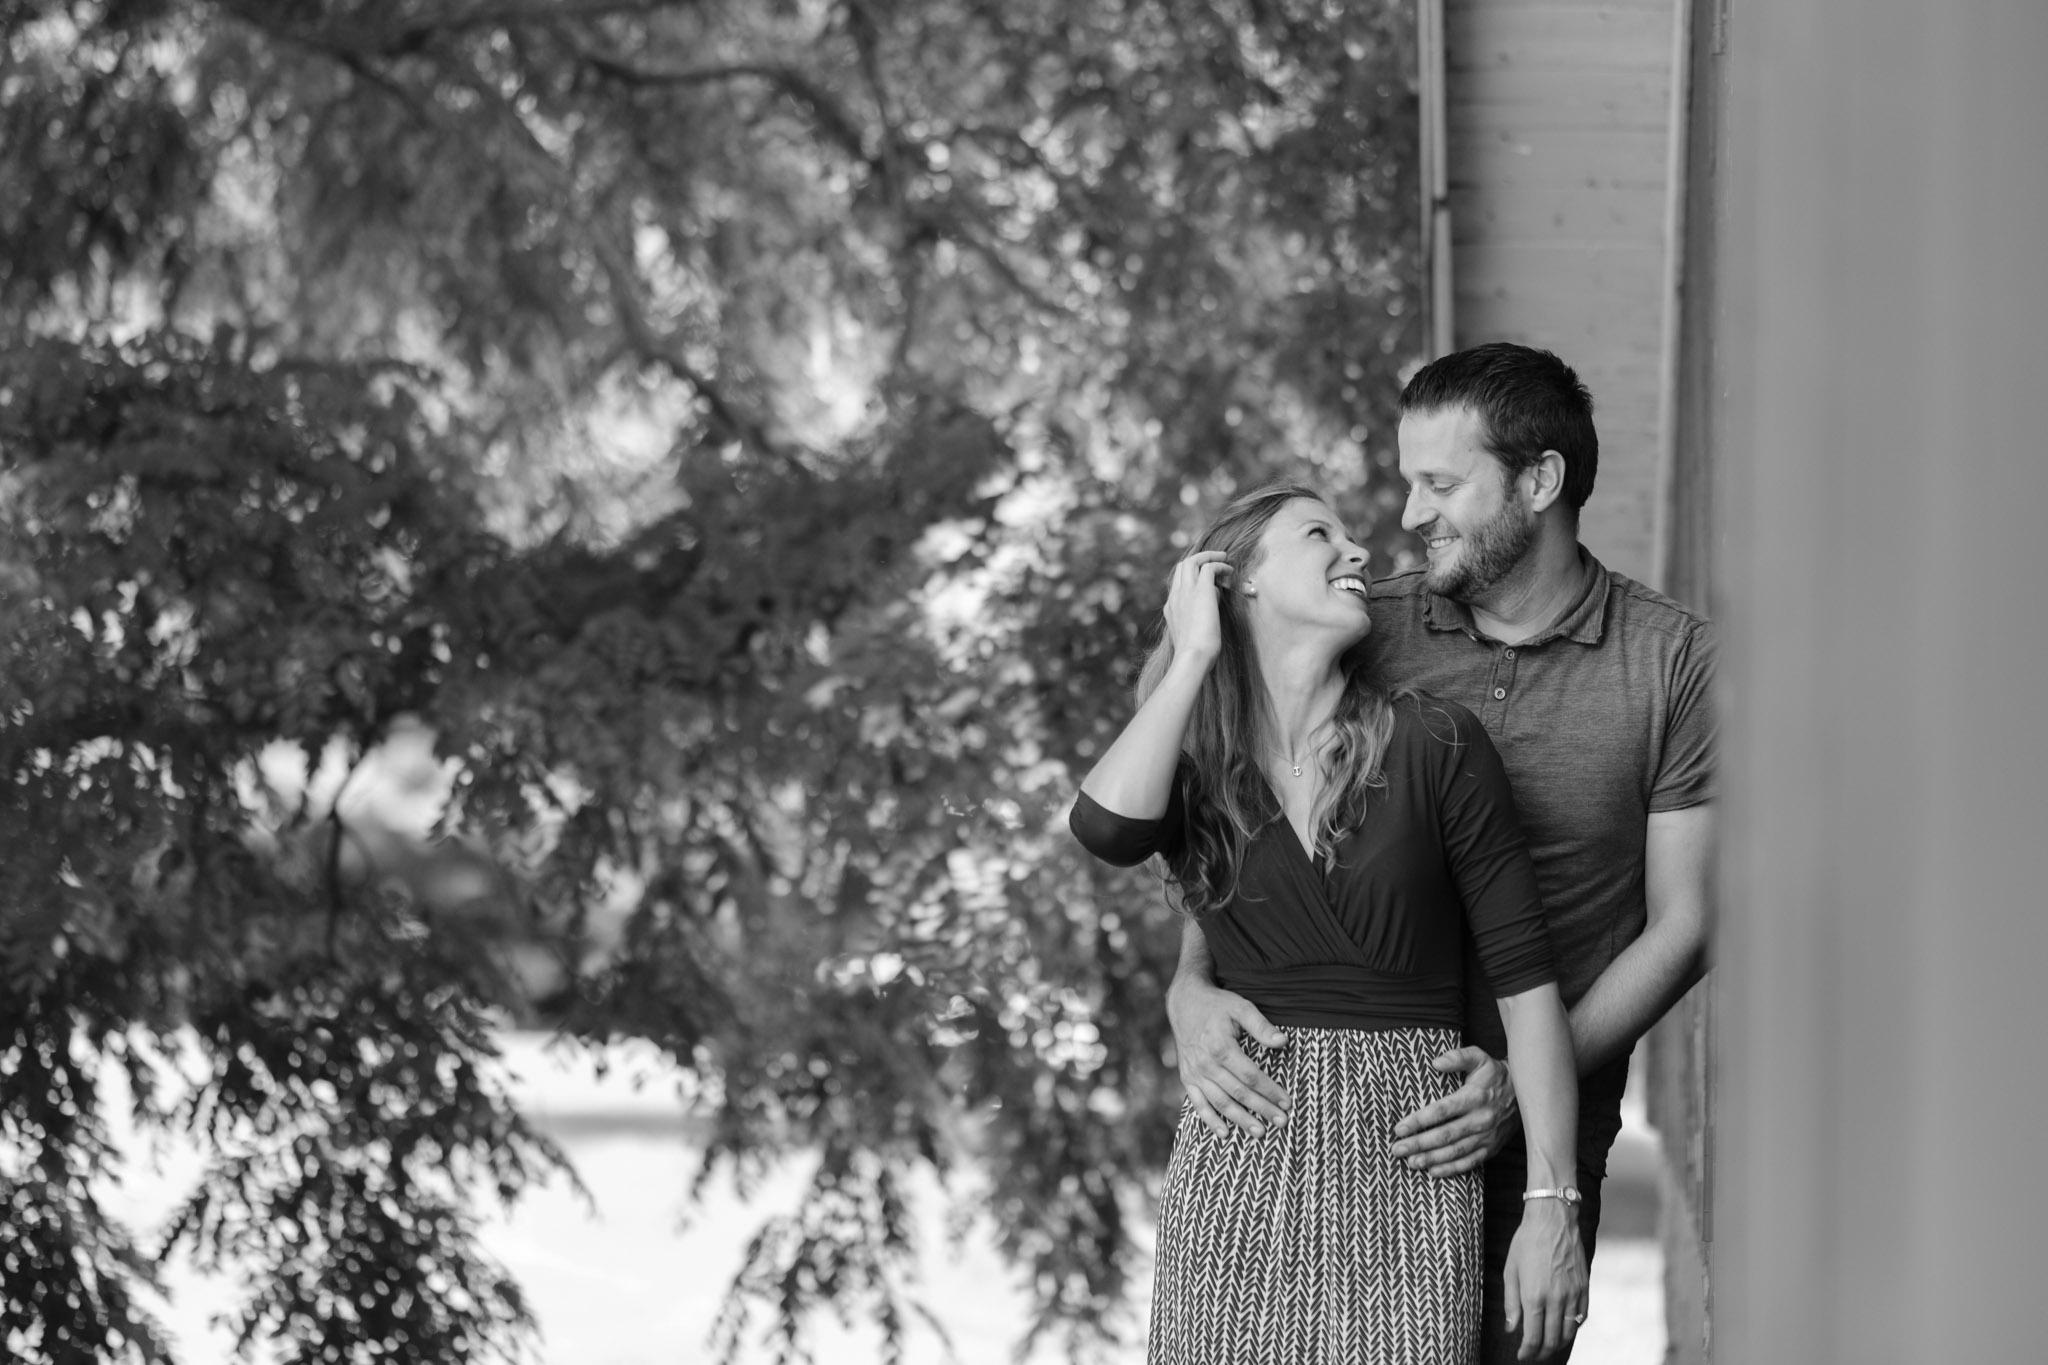 2018 BAP Pavilion at Orchard Ridge Farms Engagement Rockton Wedding-10.jpg